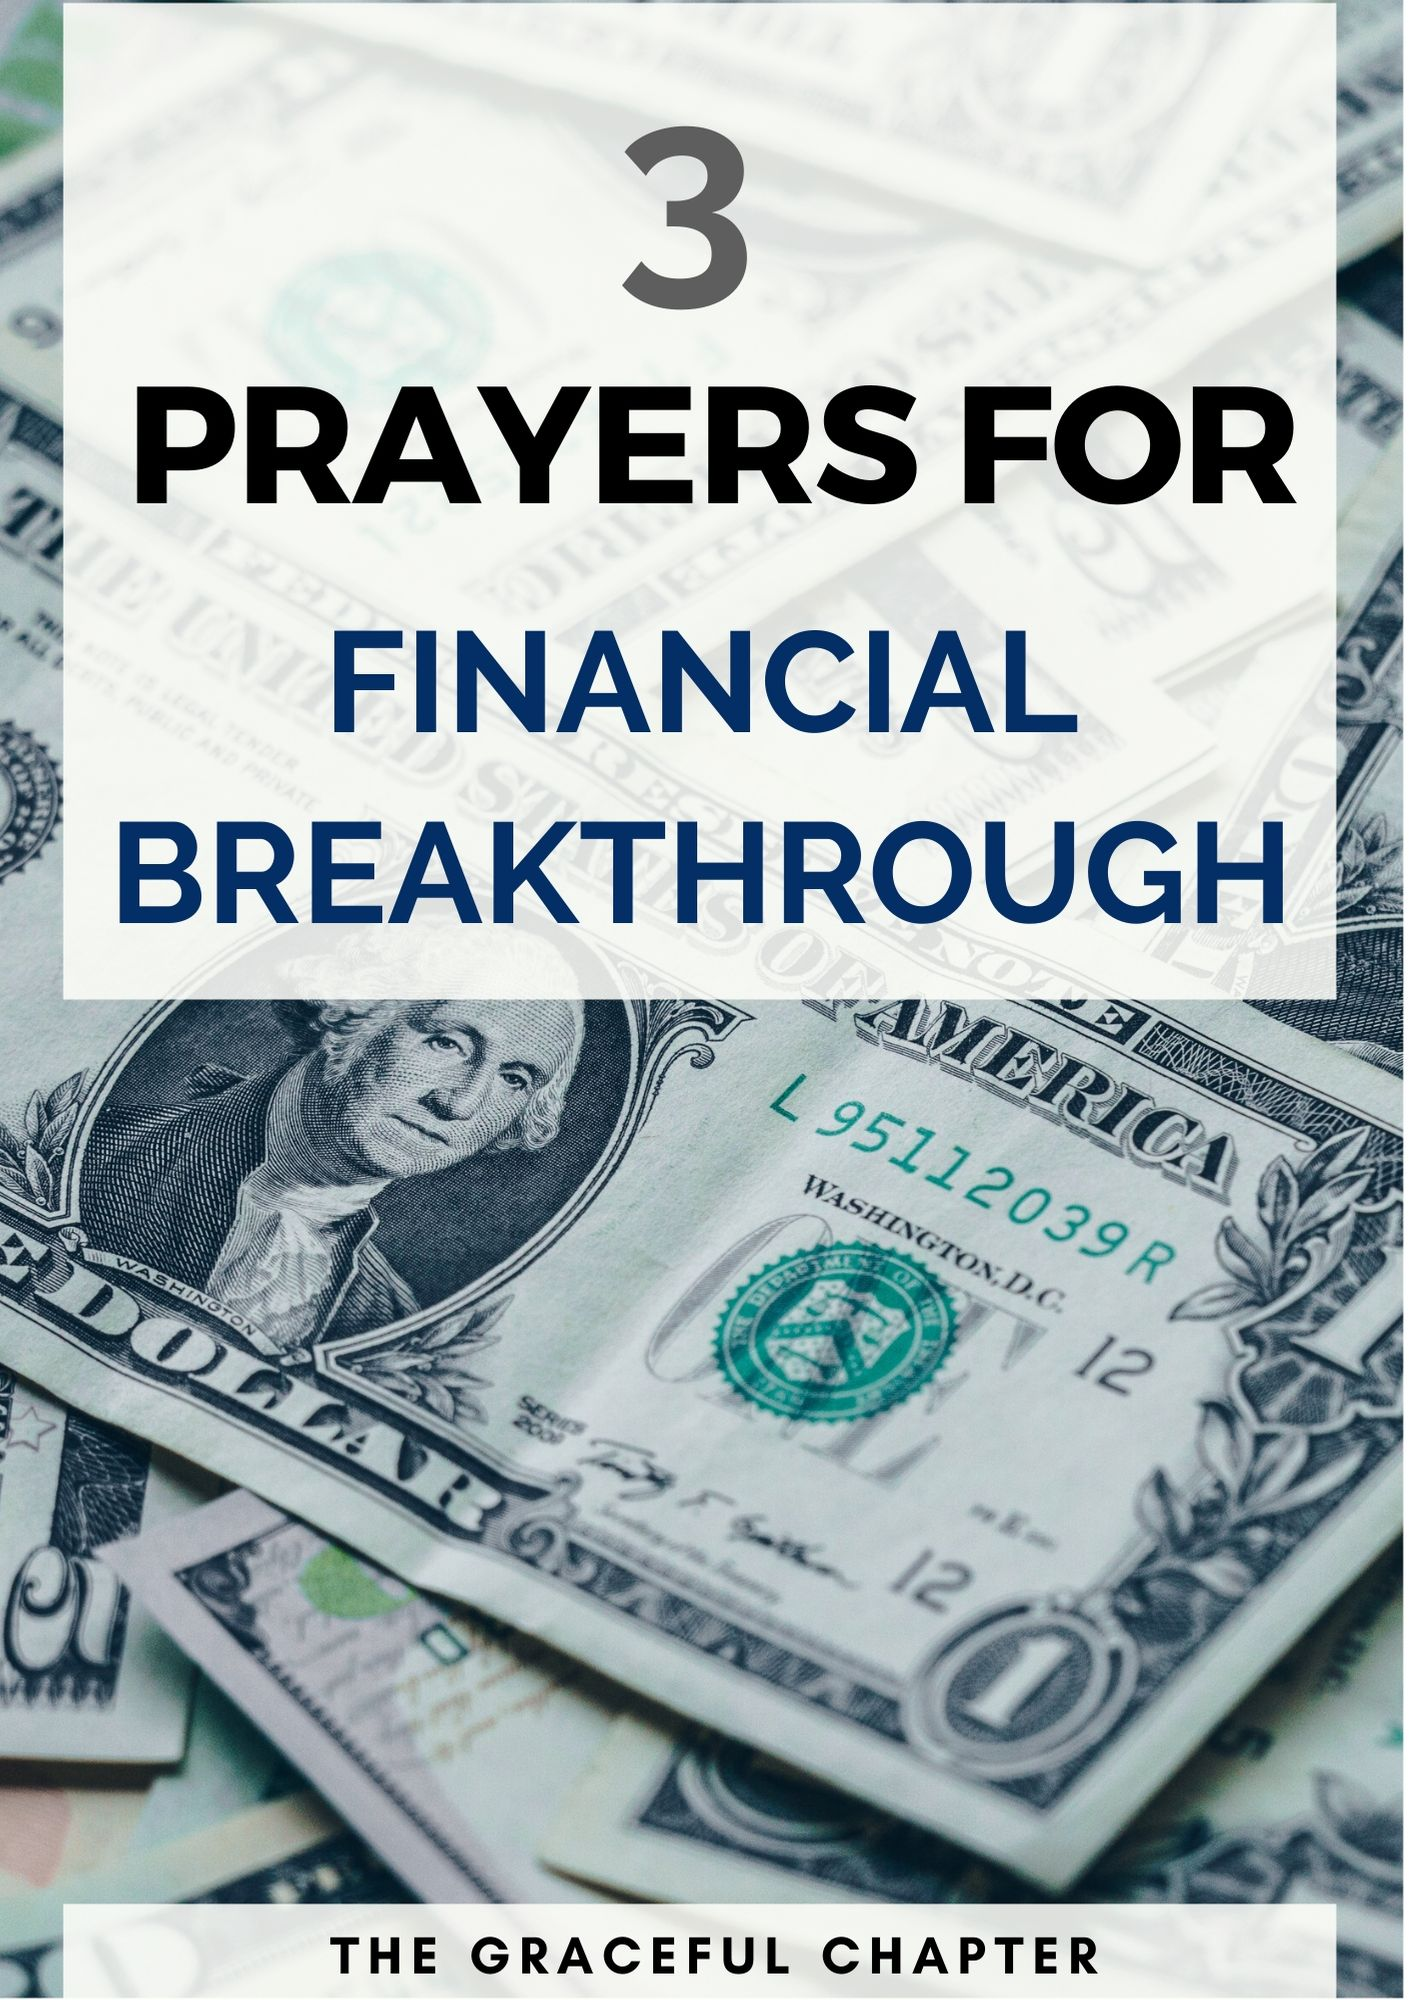 3 prayers for financial breakthrough